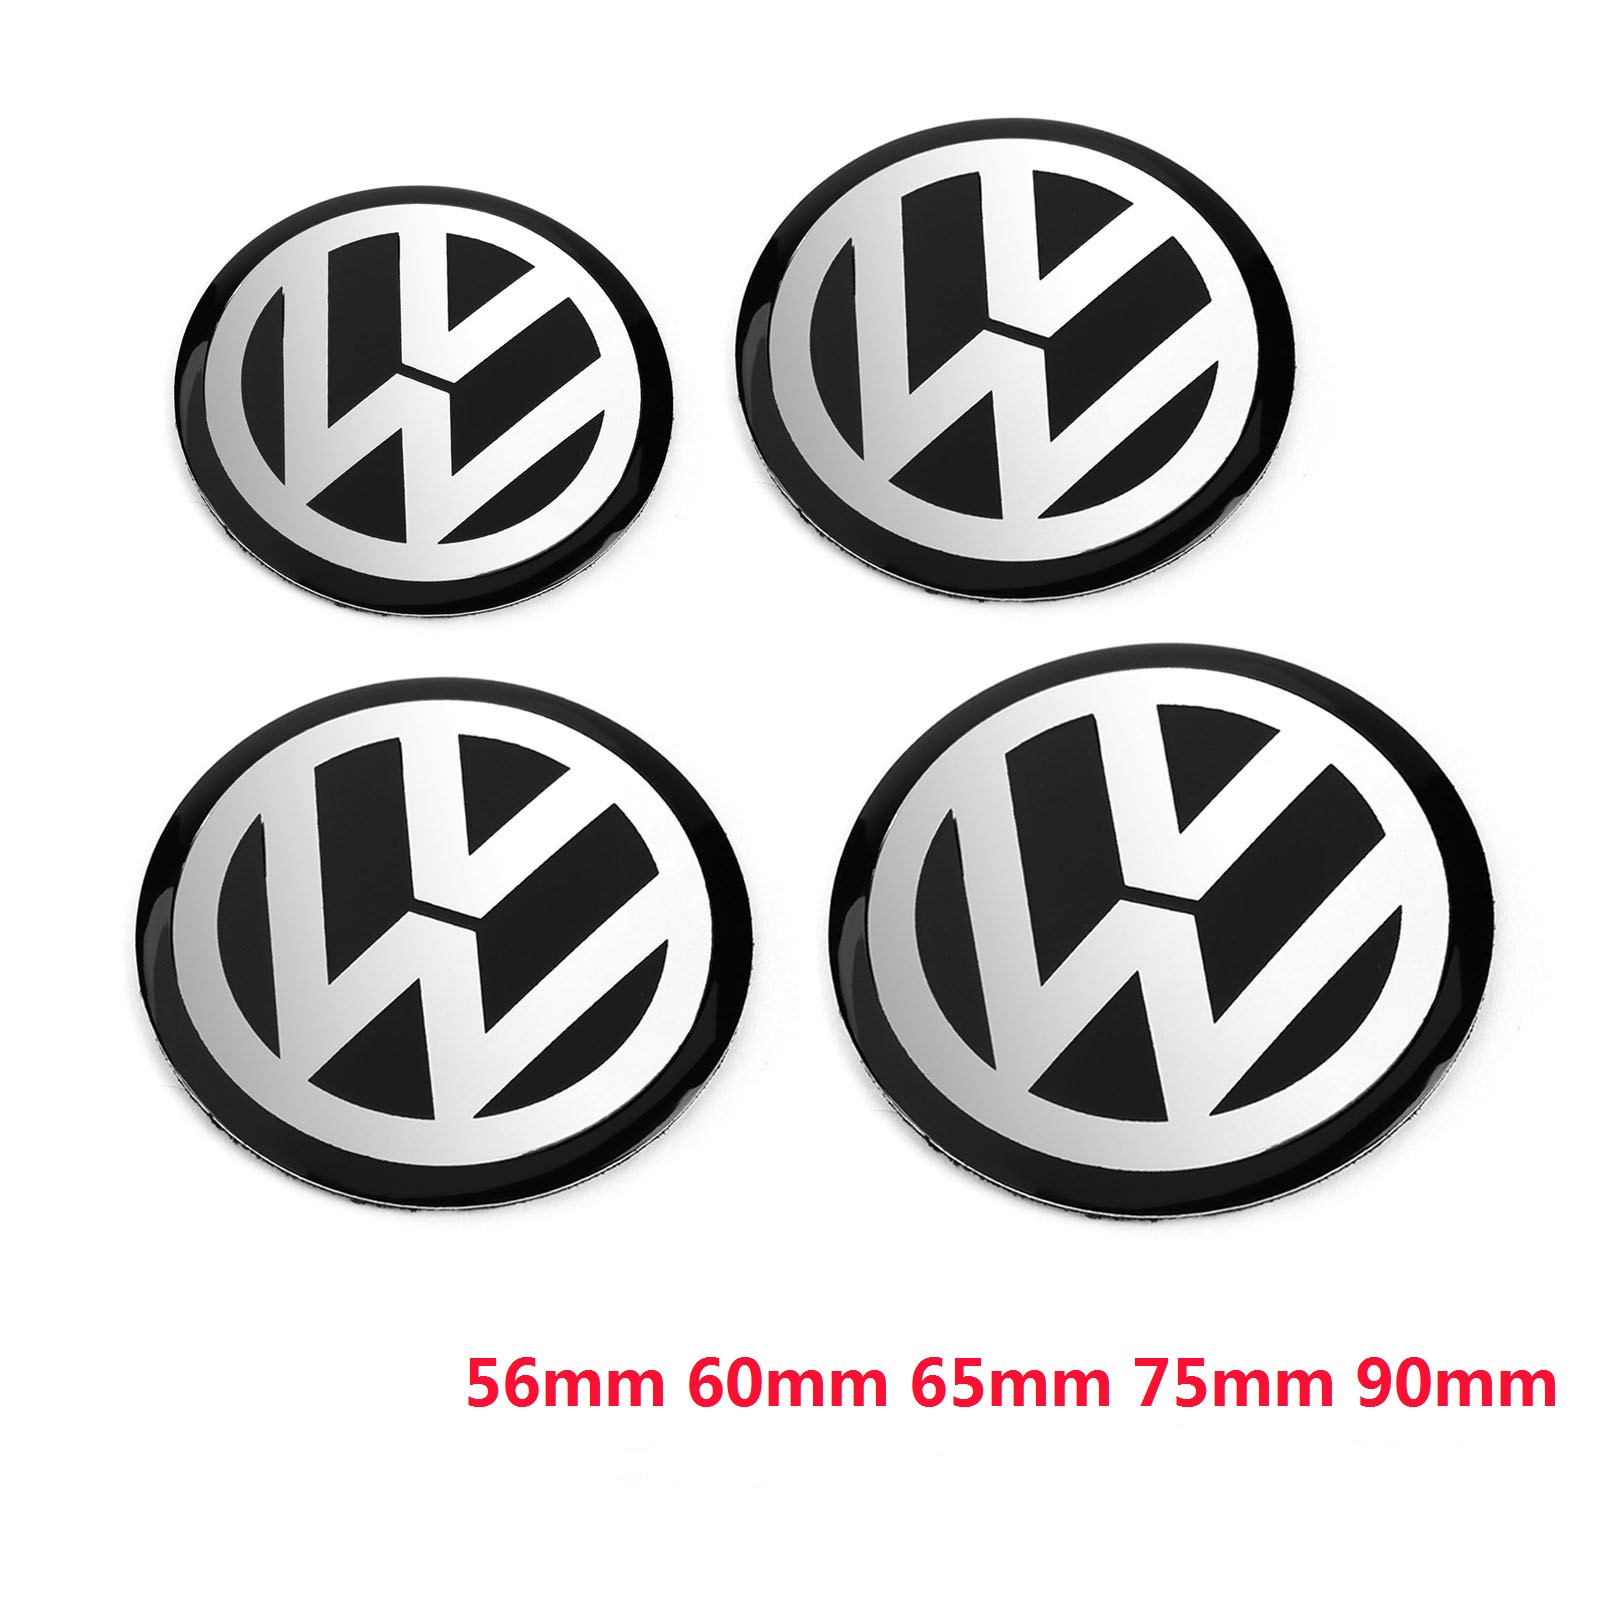 4 Stuks 56 Mm 60 Mm 65 Mm 75 Mm 90 Mm Zwarte Auto Wiel Center Hub Cap Badge Logo embleem Decal Wiel Sticker Styling Voor Vw